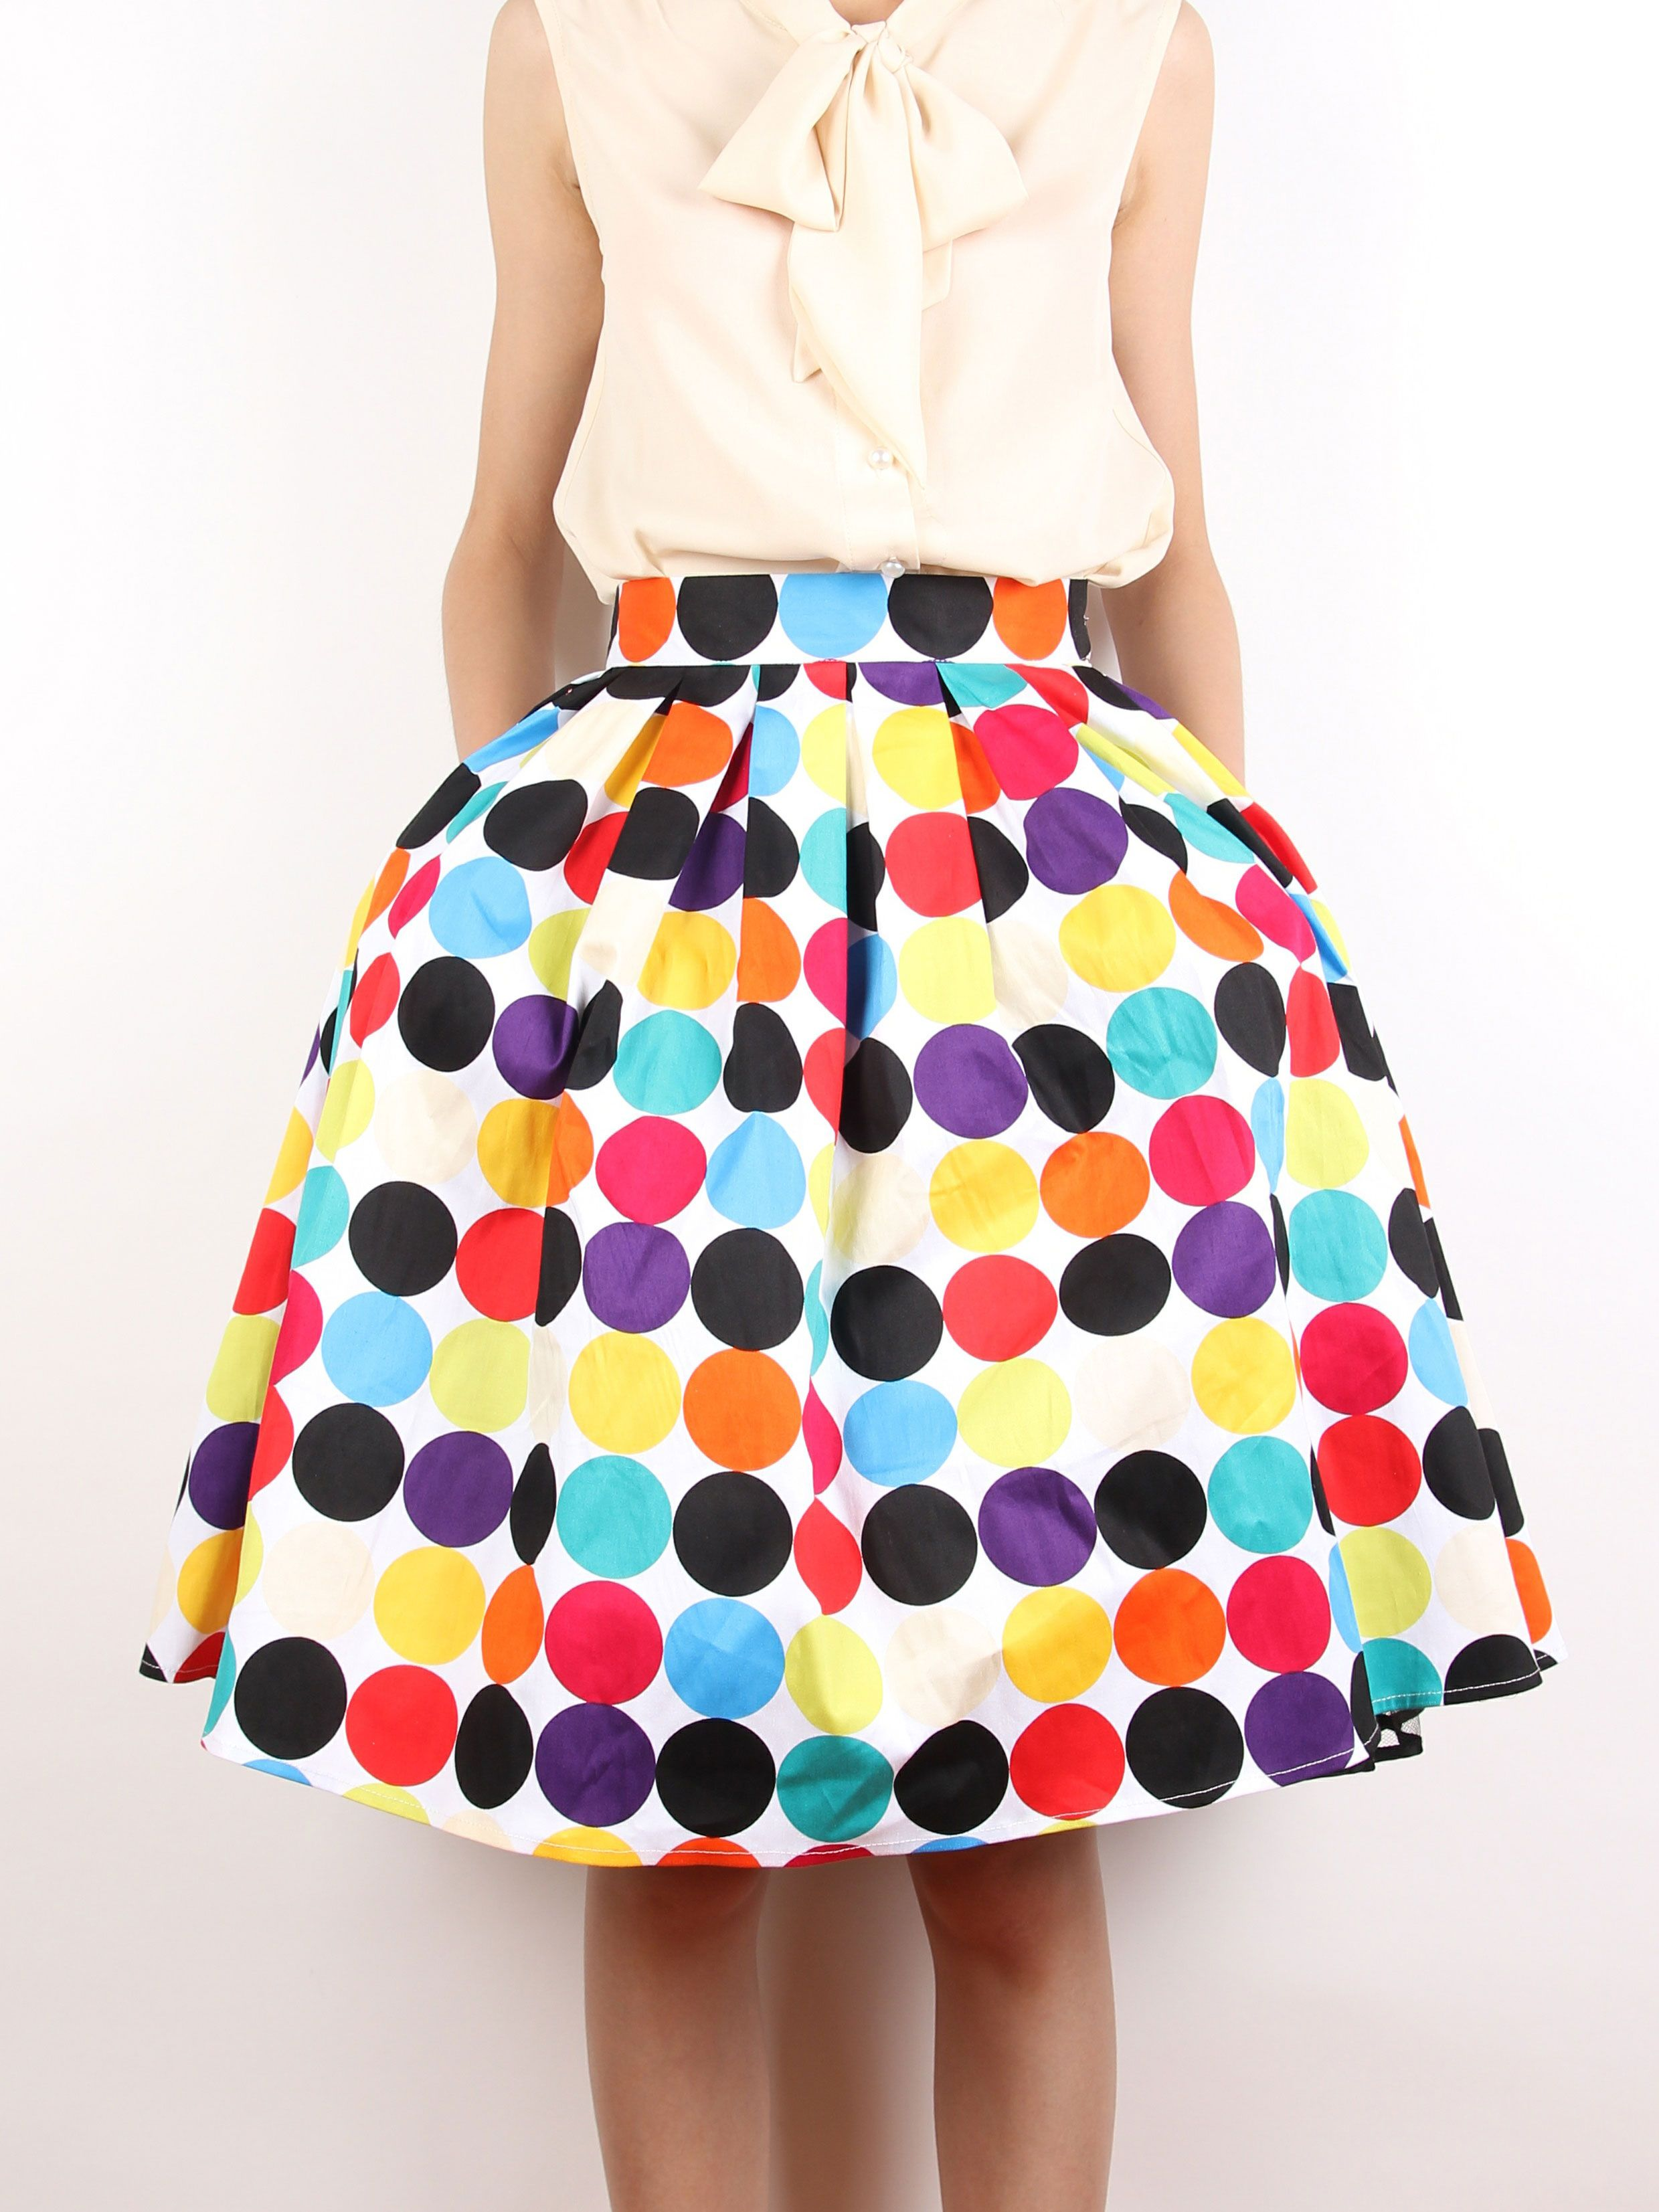 Choies Limited Edition Multi Polka Dot Print High Waist Skate Skirt